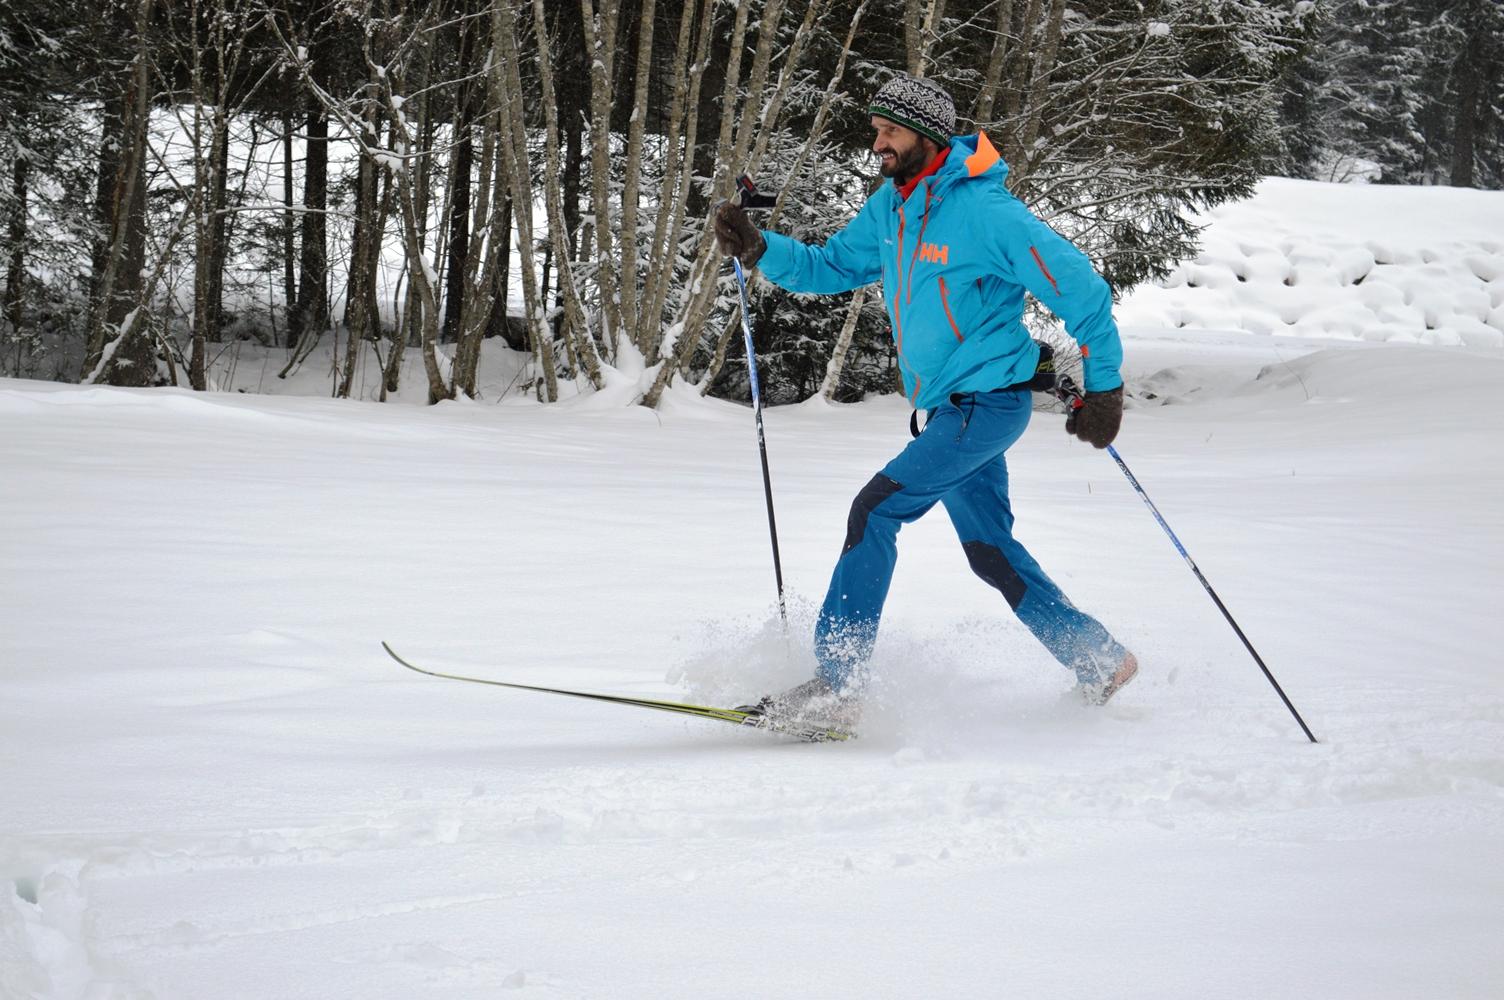 foulée-ski-de-fond-poudreuse-chamonix